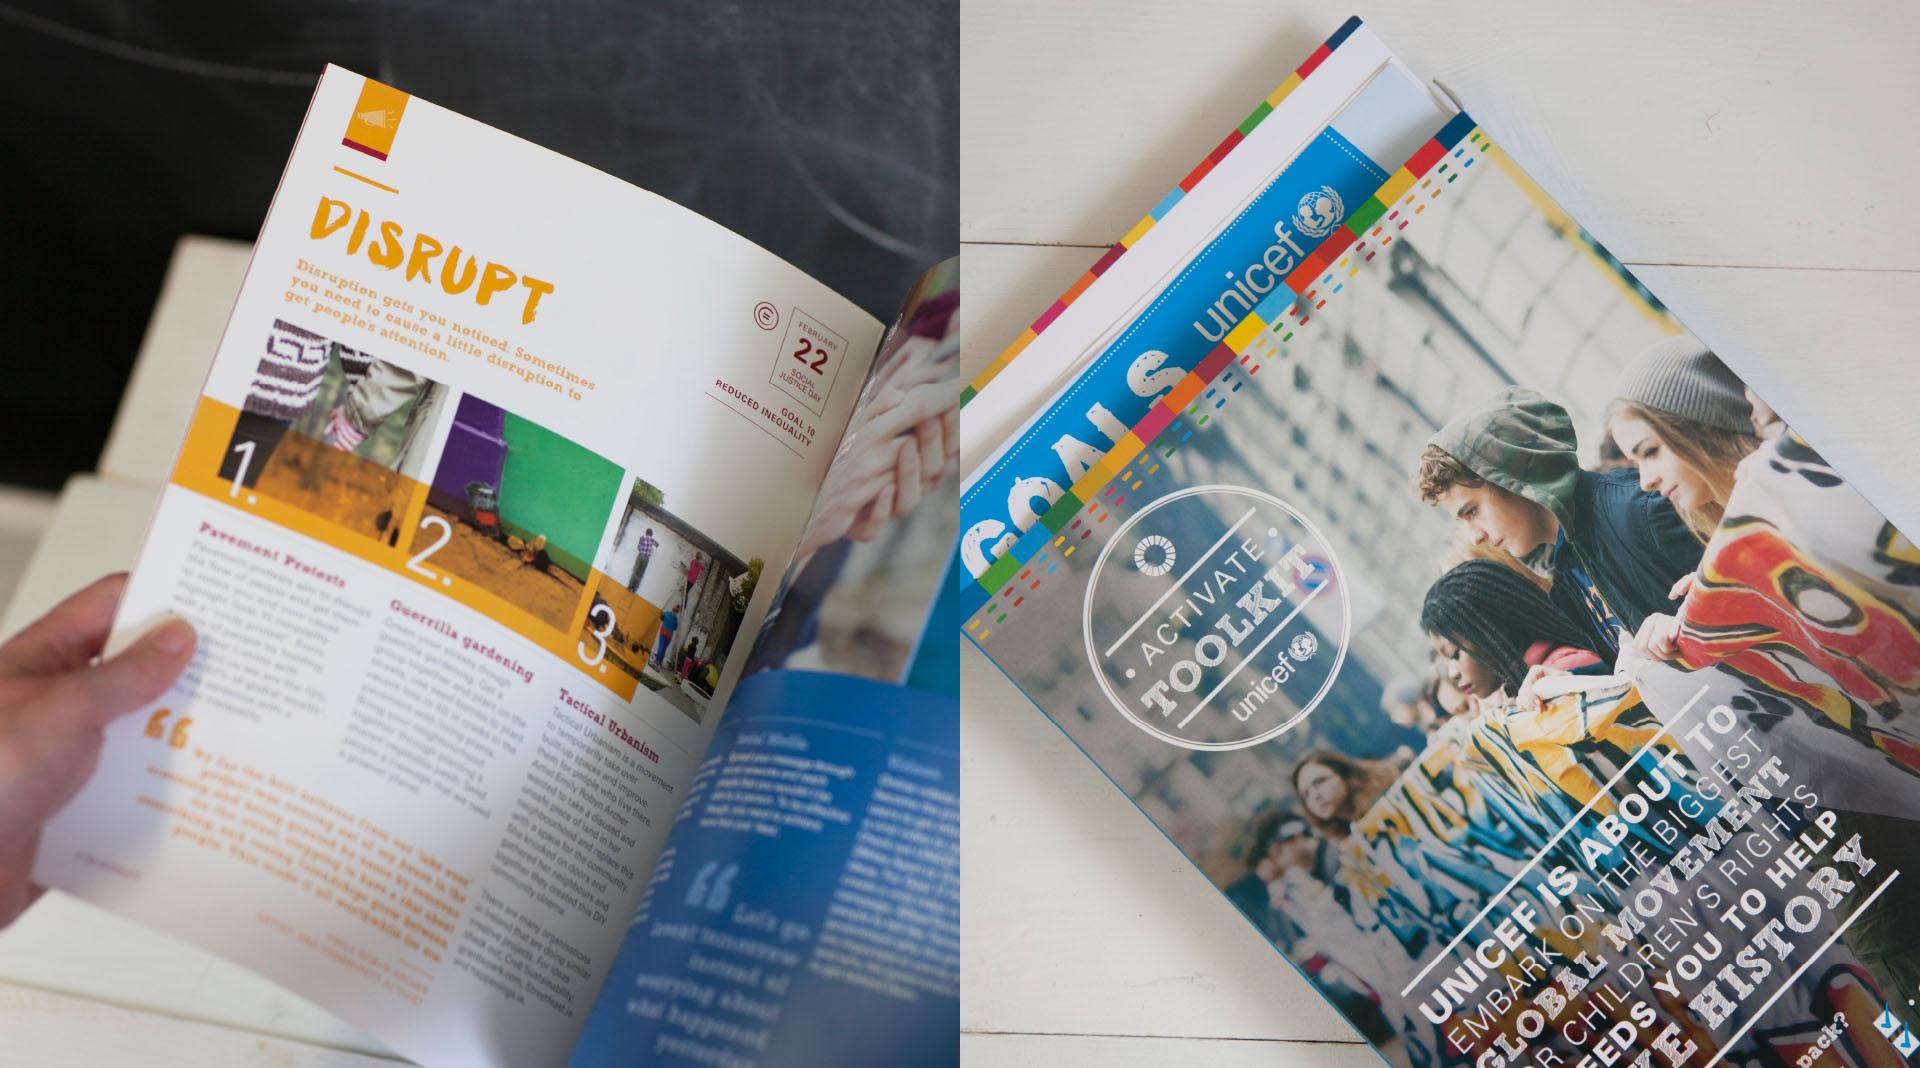 Unicef Global Goals Folder and Spread